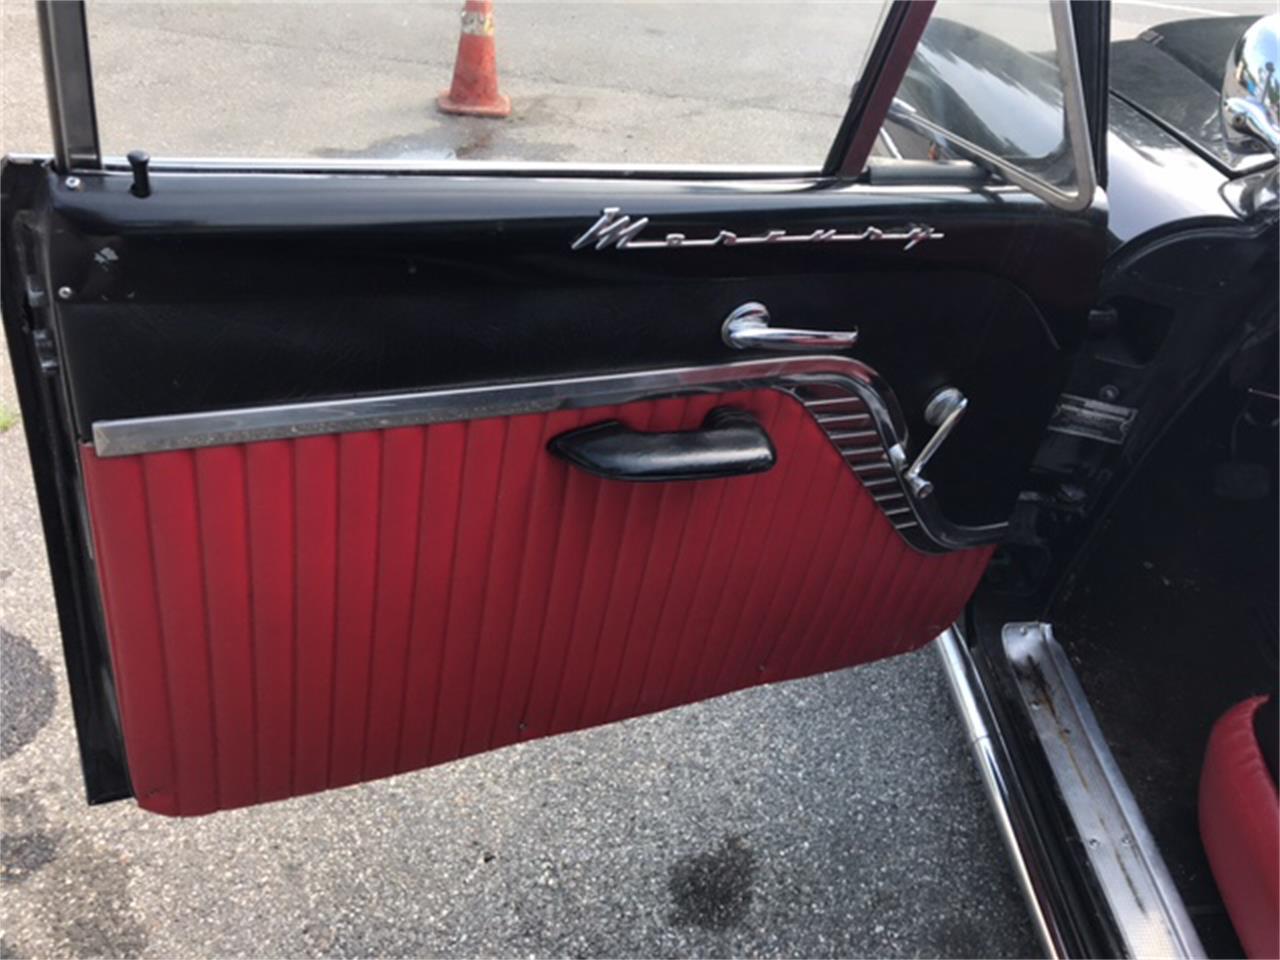 1953 Mercury Monterey (CC-1106932) for sale in Westford, Massachusetts